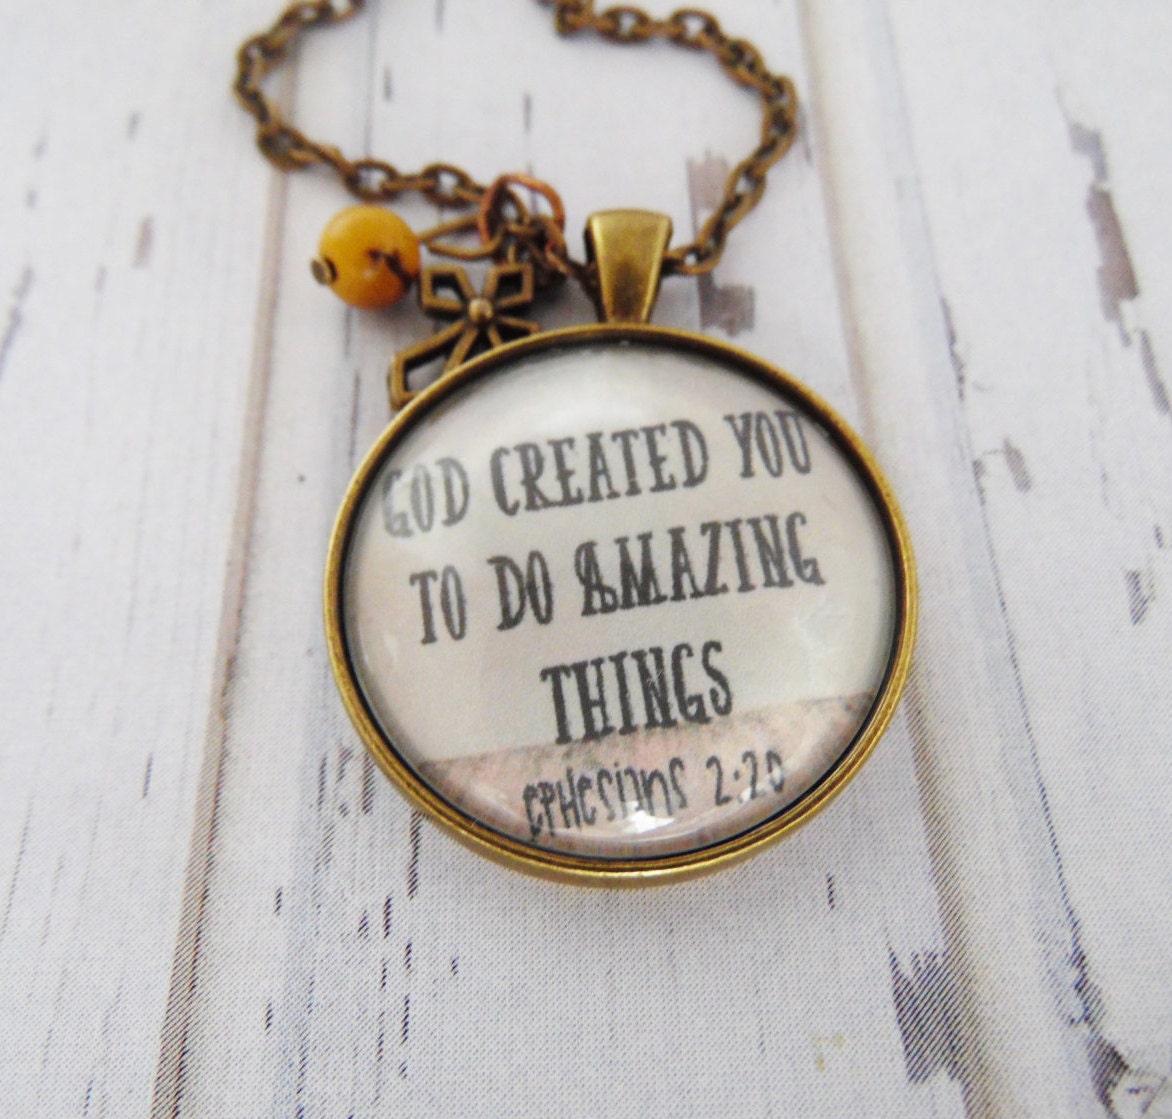 Do Amazing Things: God Created You To Do Amazing Things Necklace Encouragement